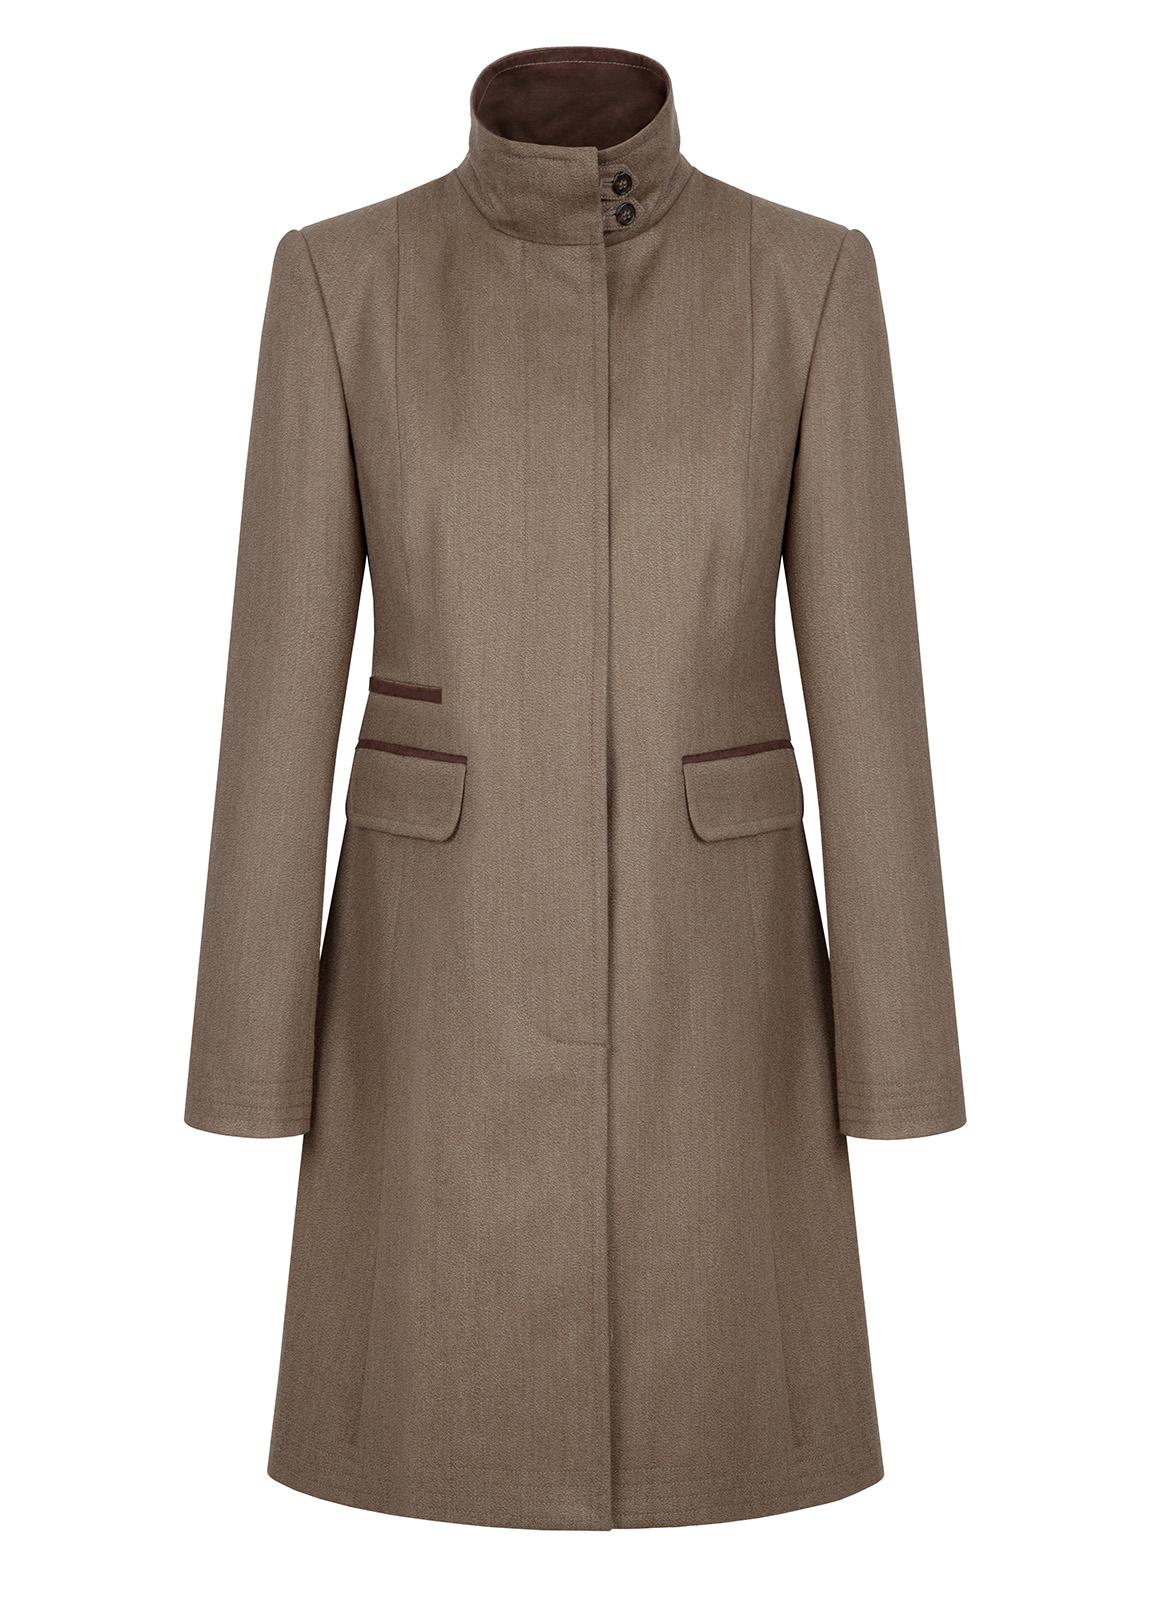 Dubarry_Elmtree Women's Covert Coat - Pine_Image_2